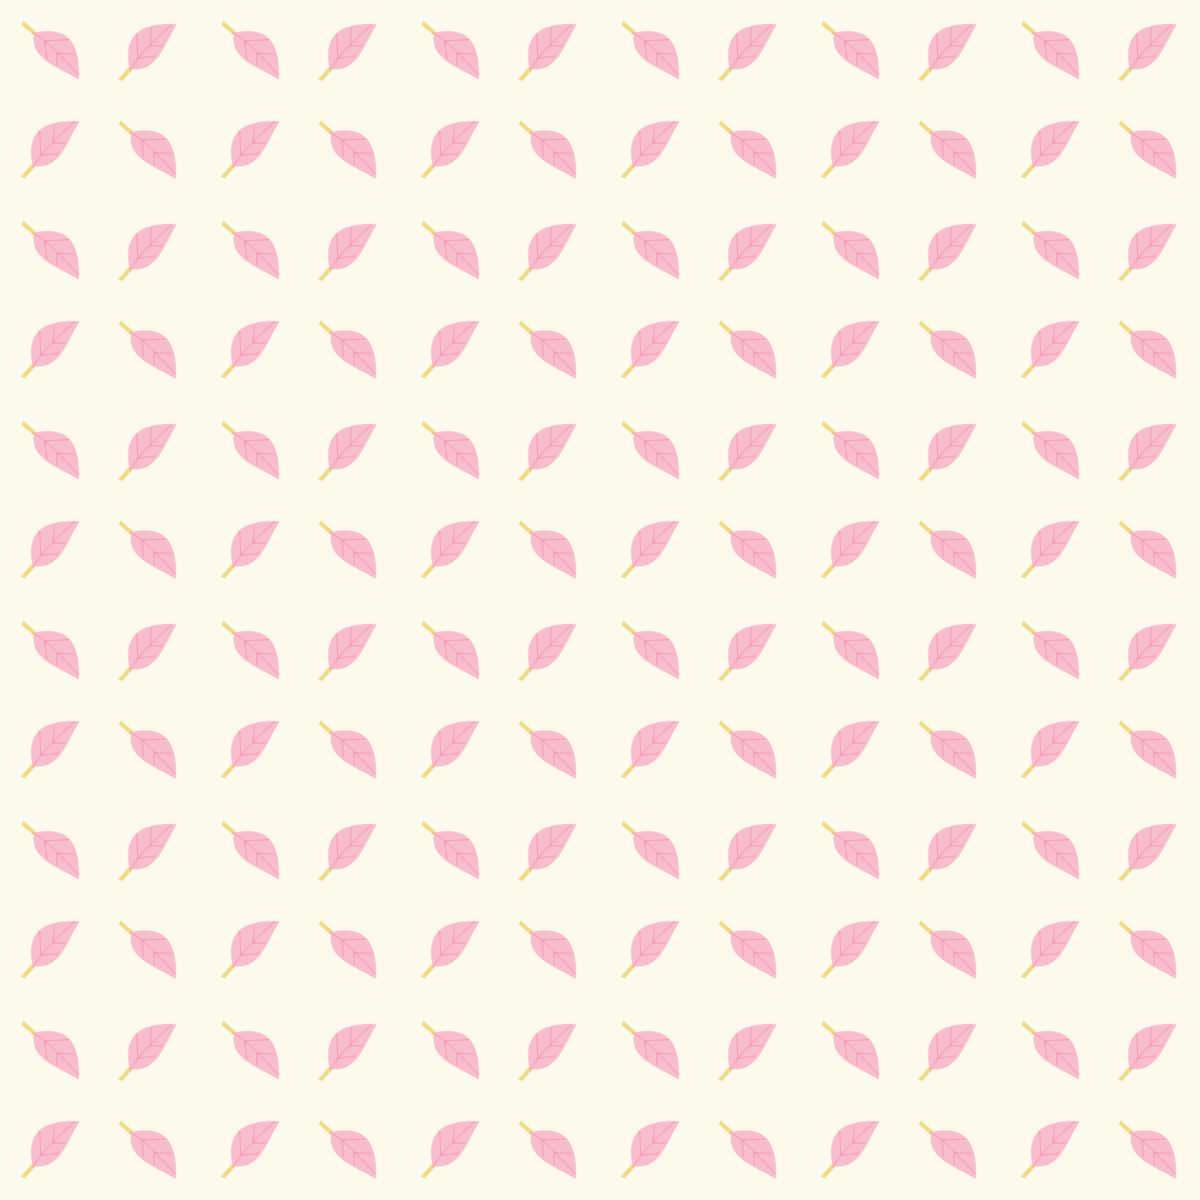 Scrapbook paper baby - Free Digital Baby Pink And Vanilla Colored Scrapbooking Paper